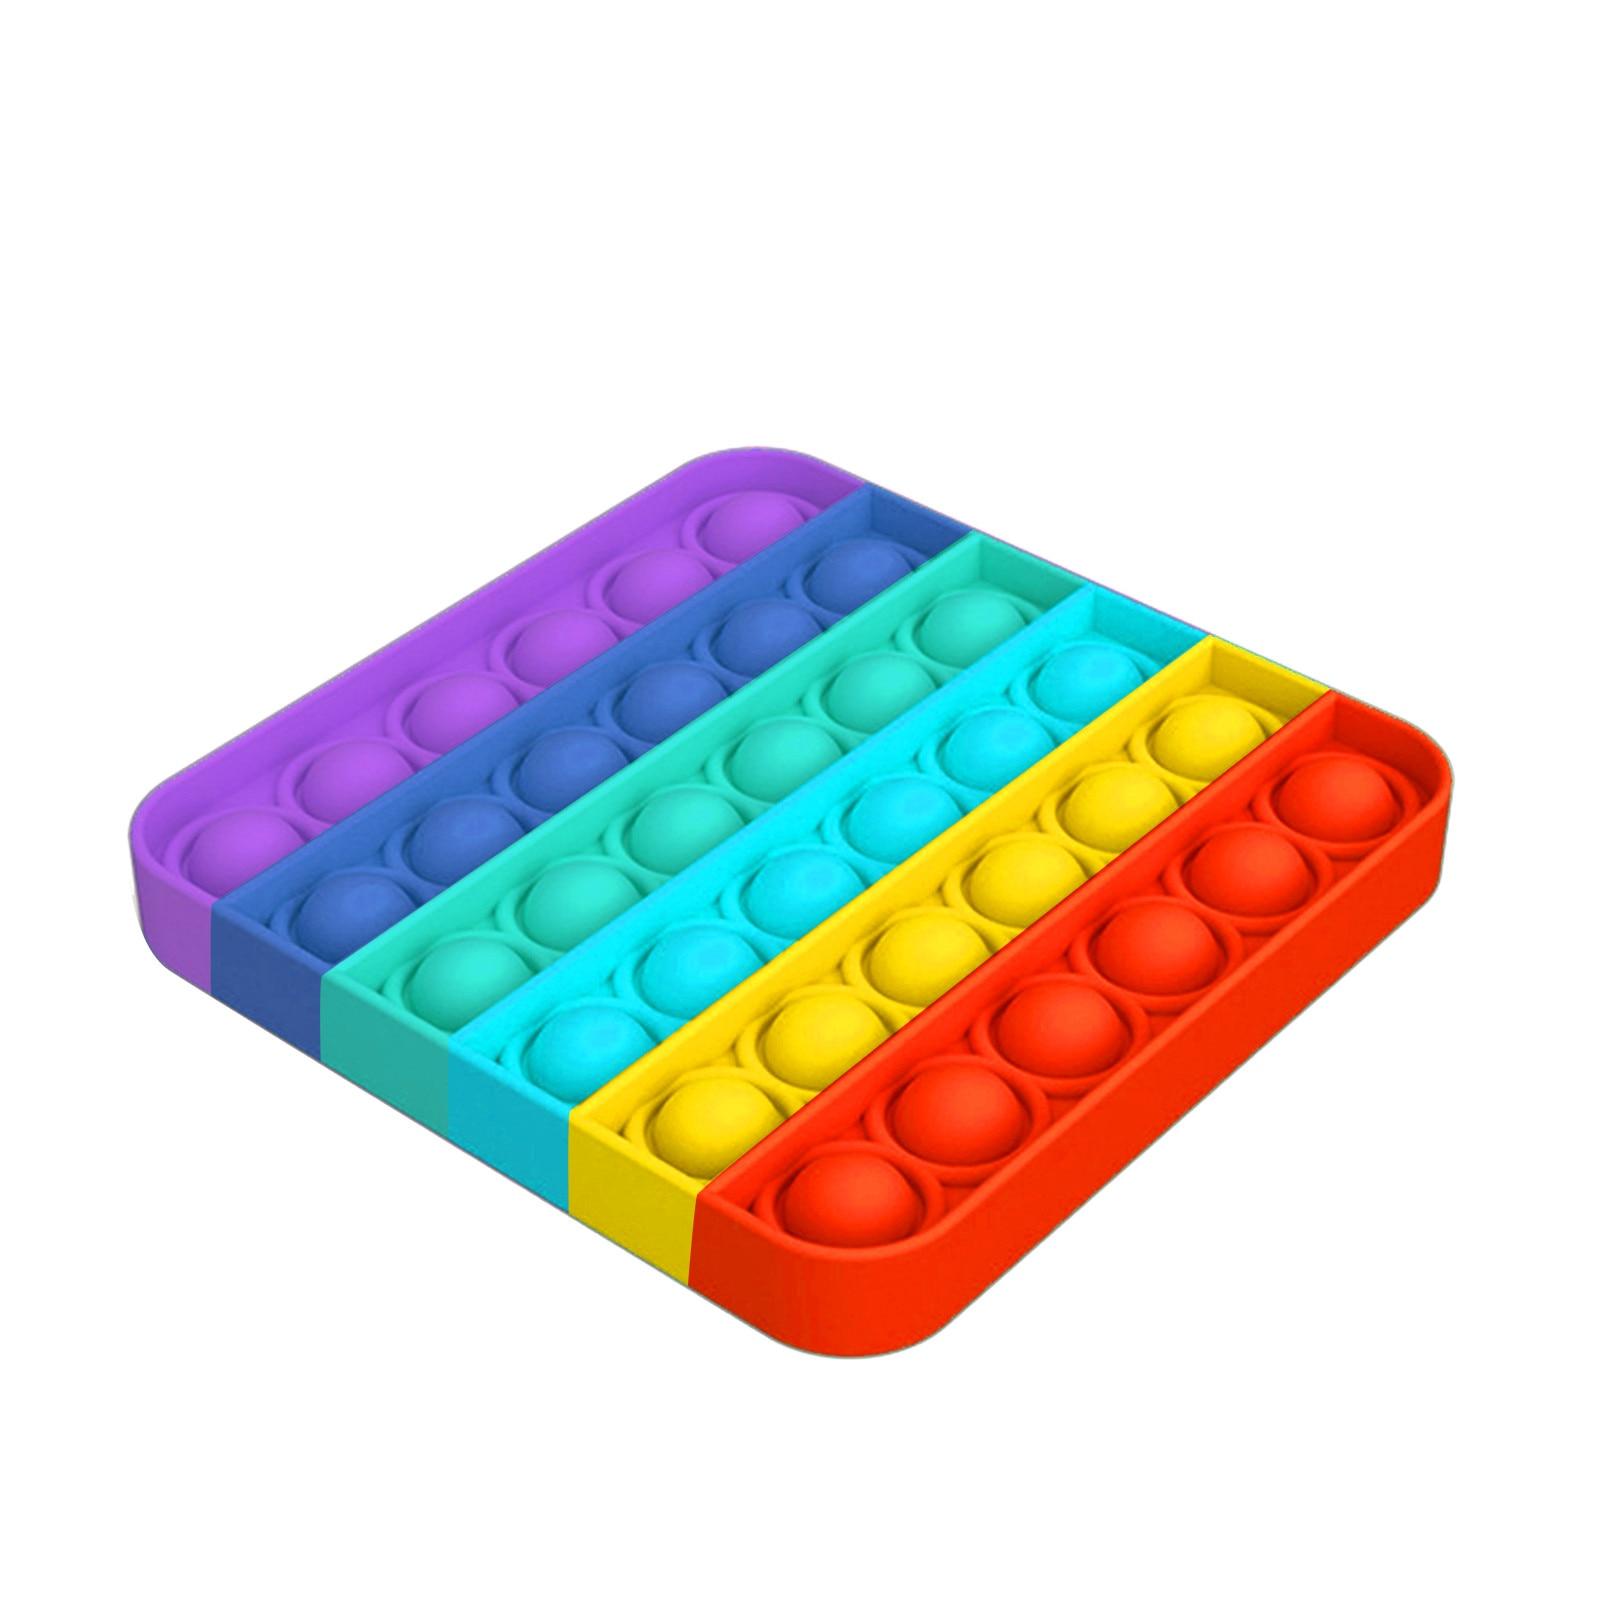 Toy Fidget-Toys Sensory-Toy Autism Needs-Stress Push Bubble Popit Special Kids Simple Dimple img2